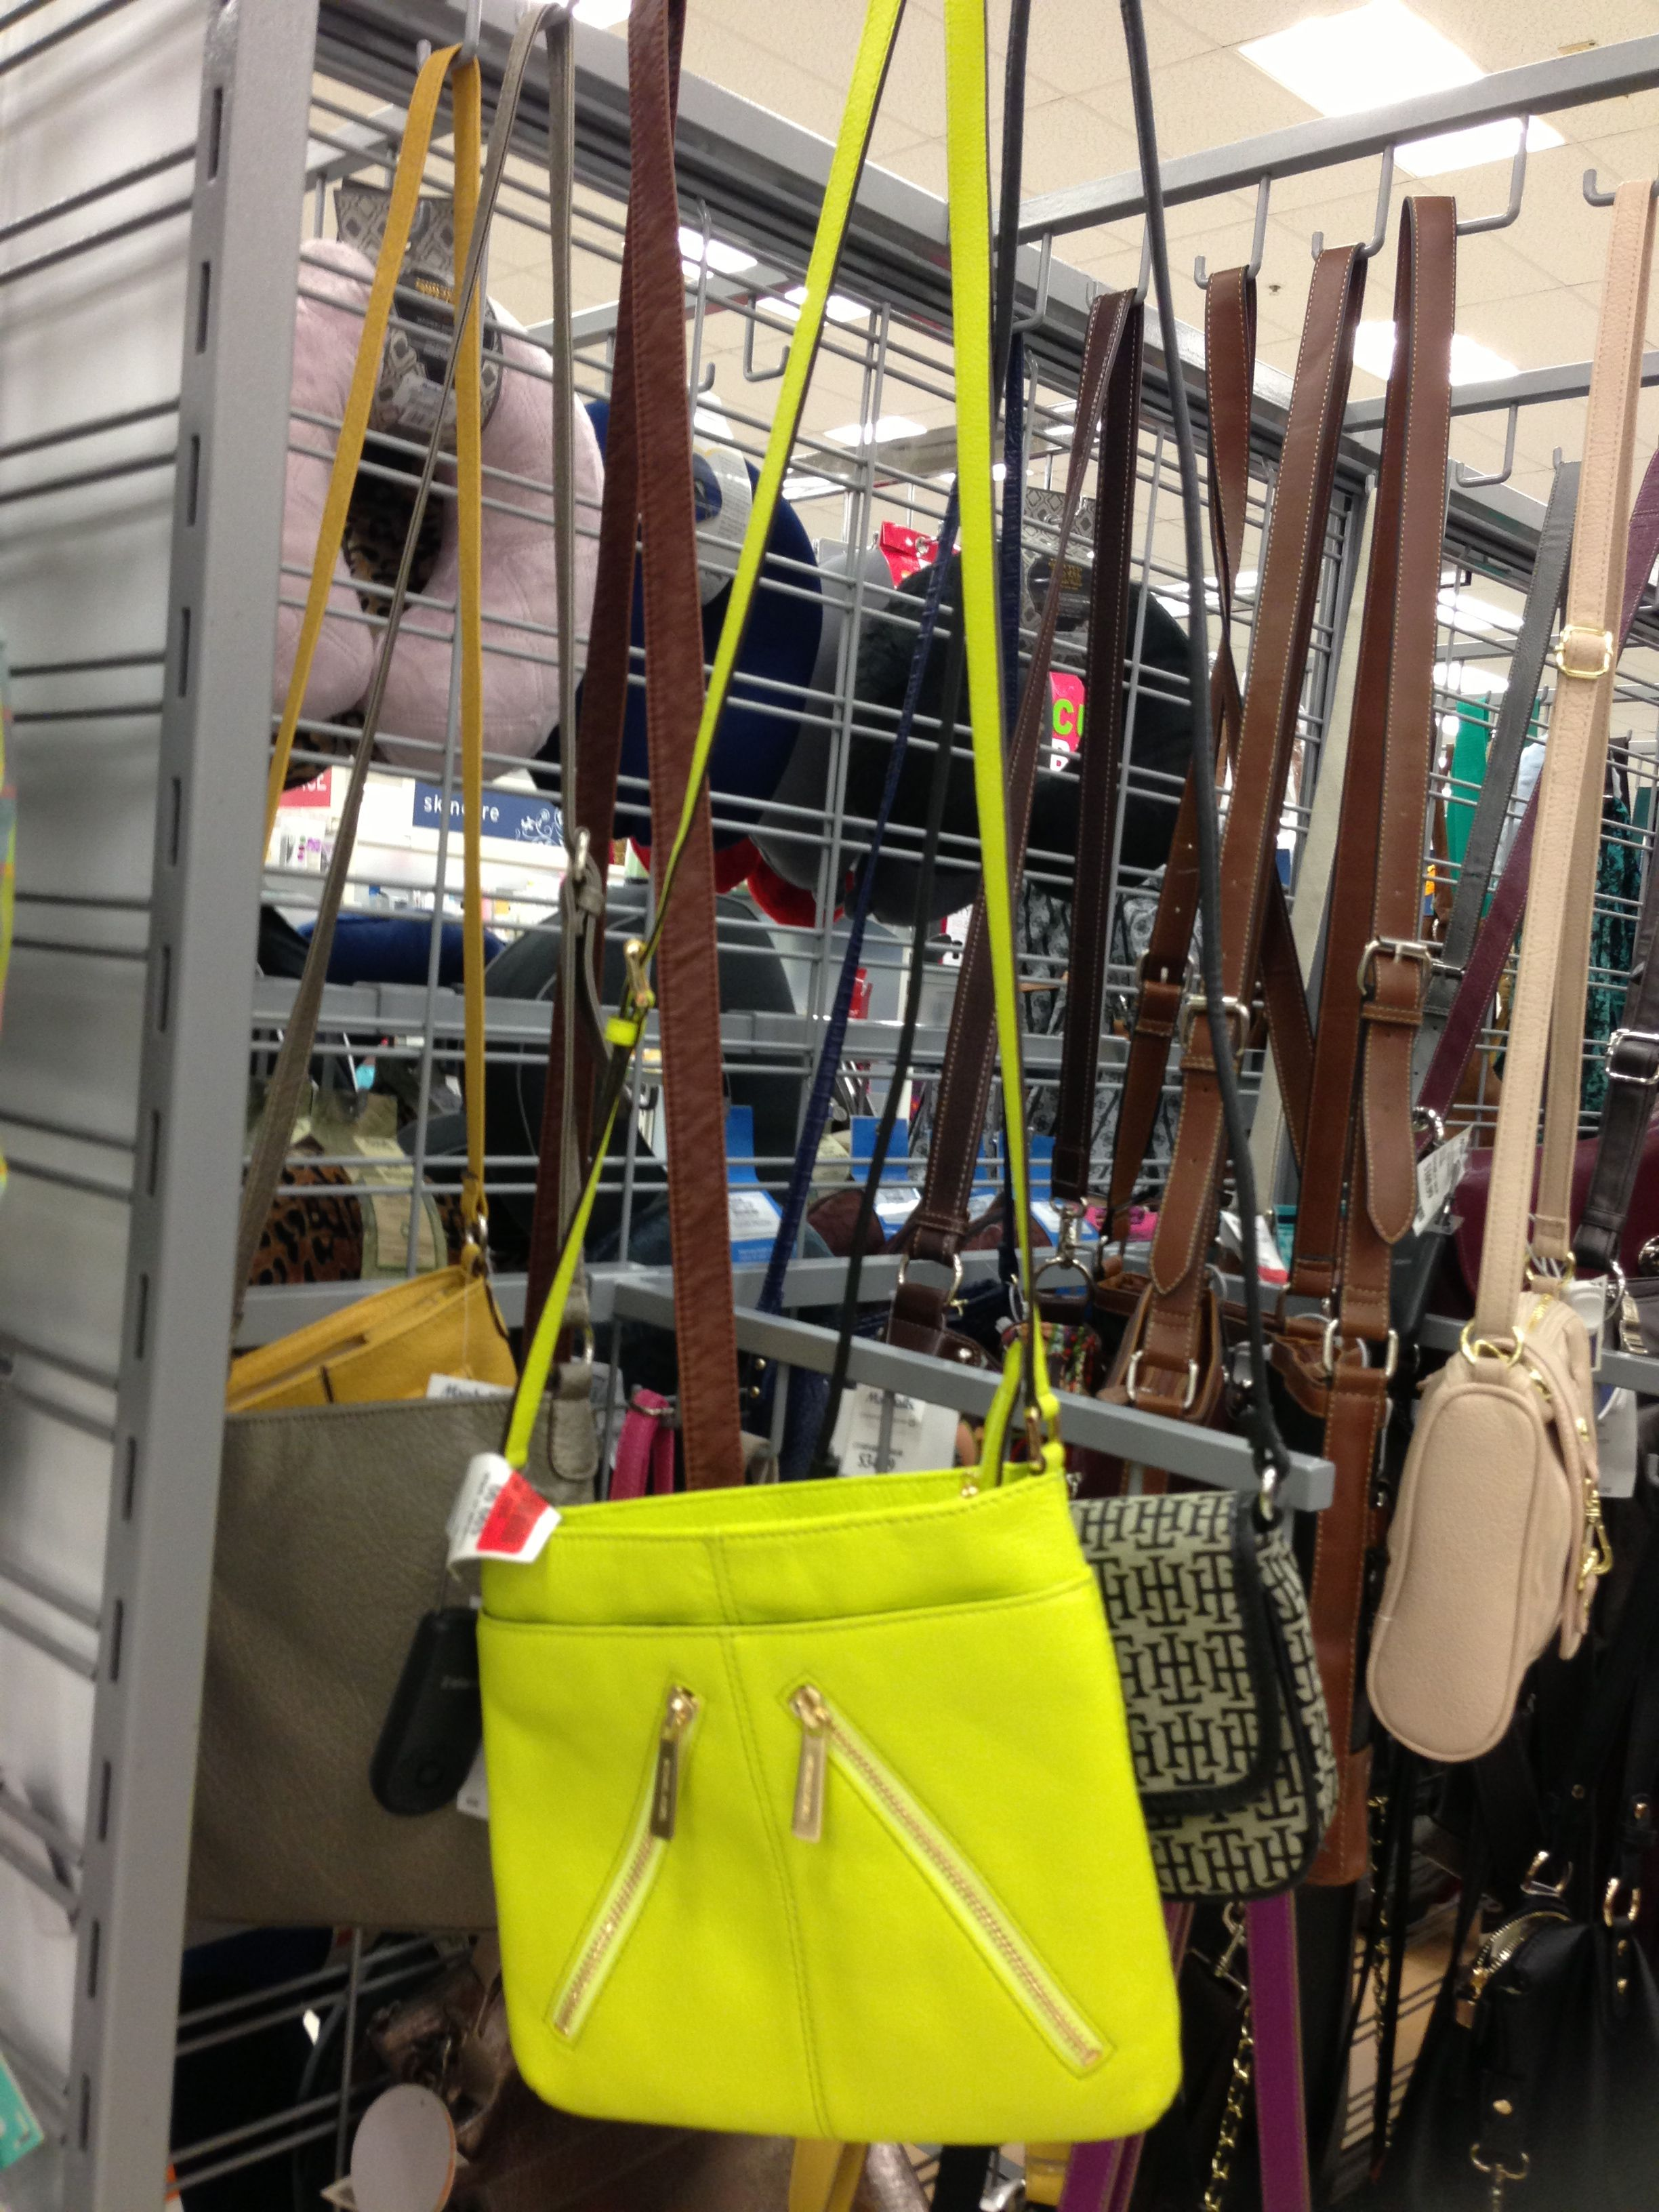 10d1a11cc69f43 ... abbey backpack nwt black 468ef 7bb81 discount michael kors lime green  cross body bag at marshalls home goods 5fc1e d4756 ...